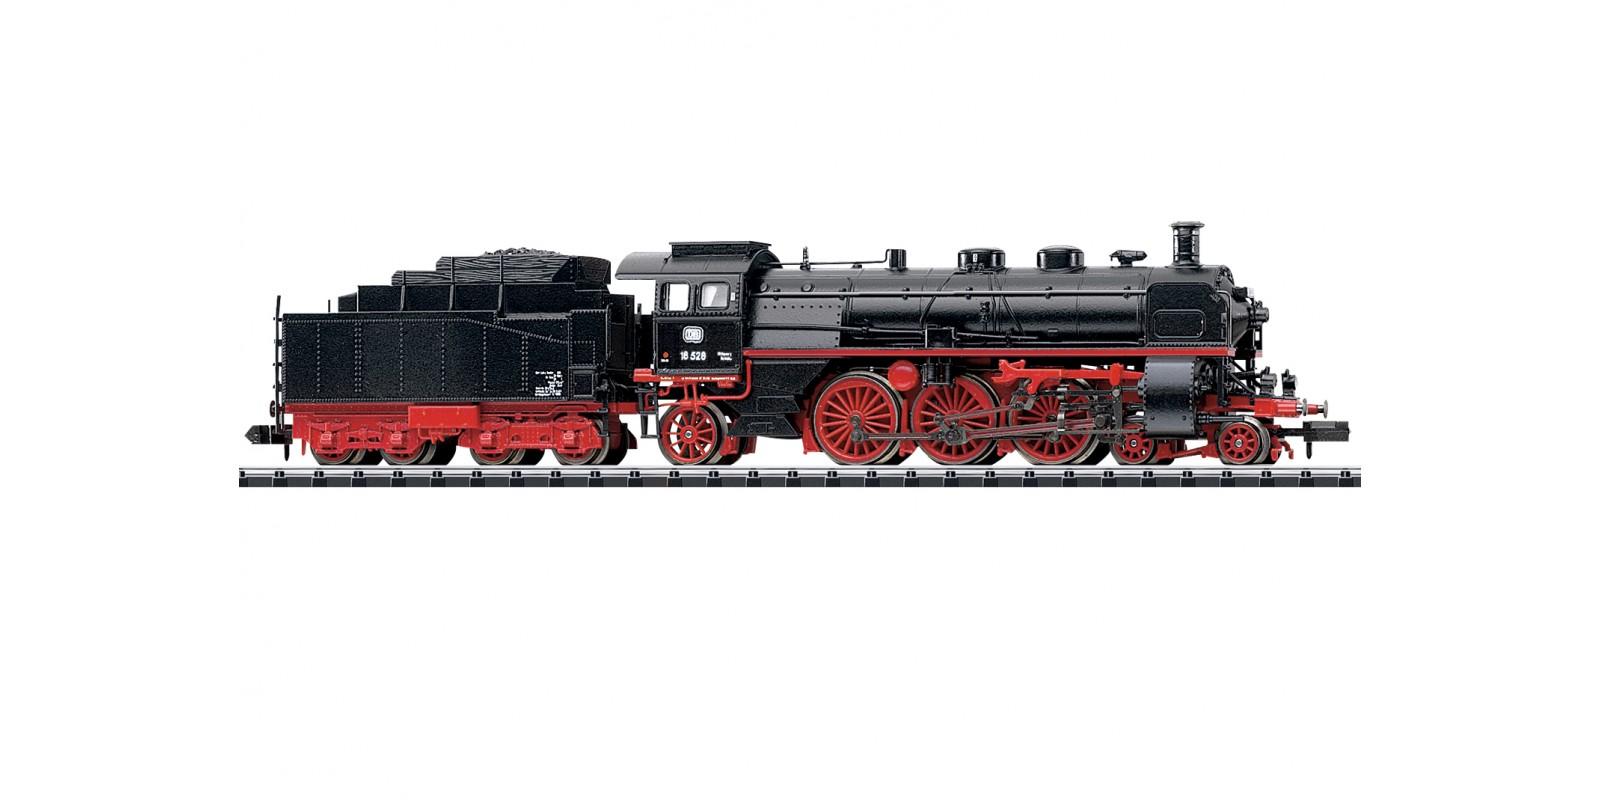 T16184 Steam Locomotive, Road Number